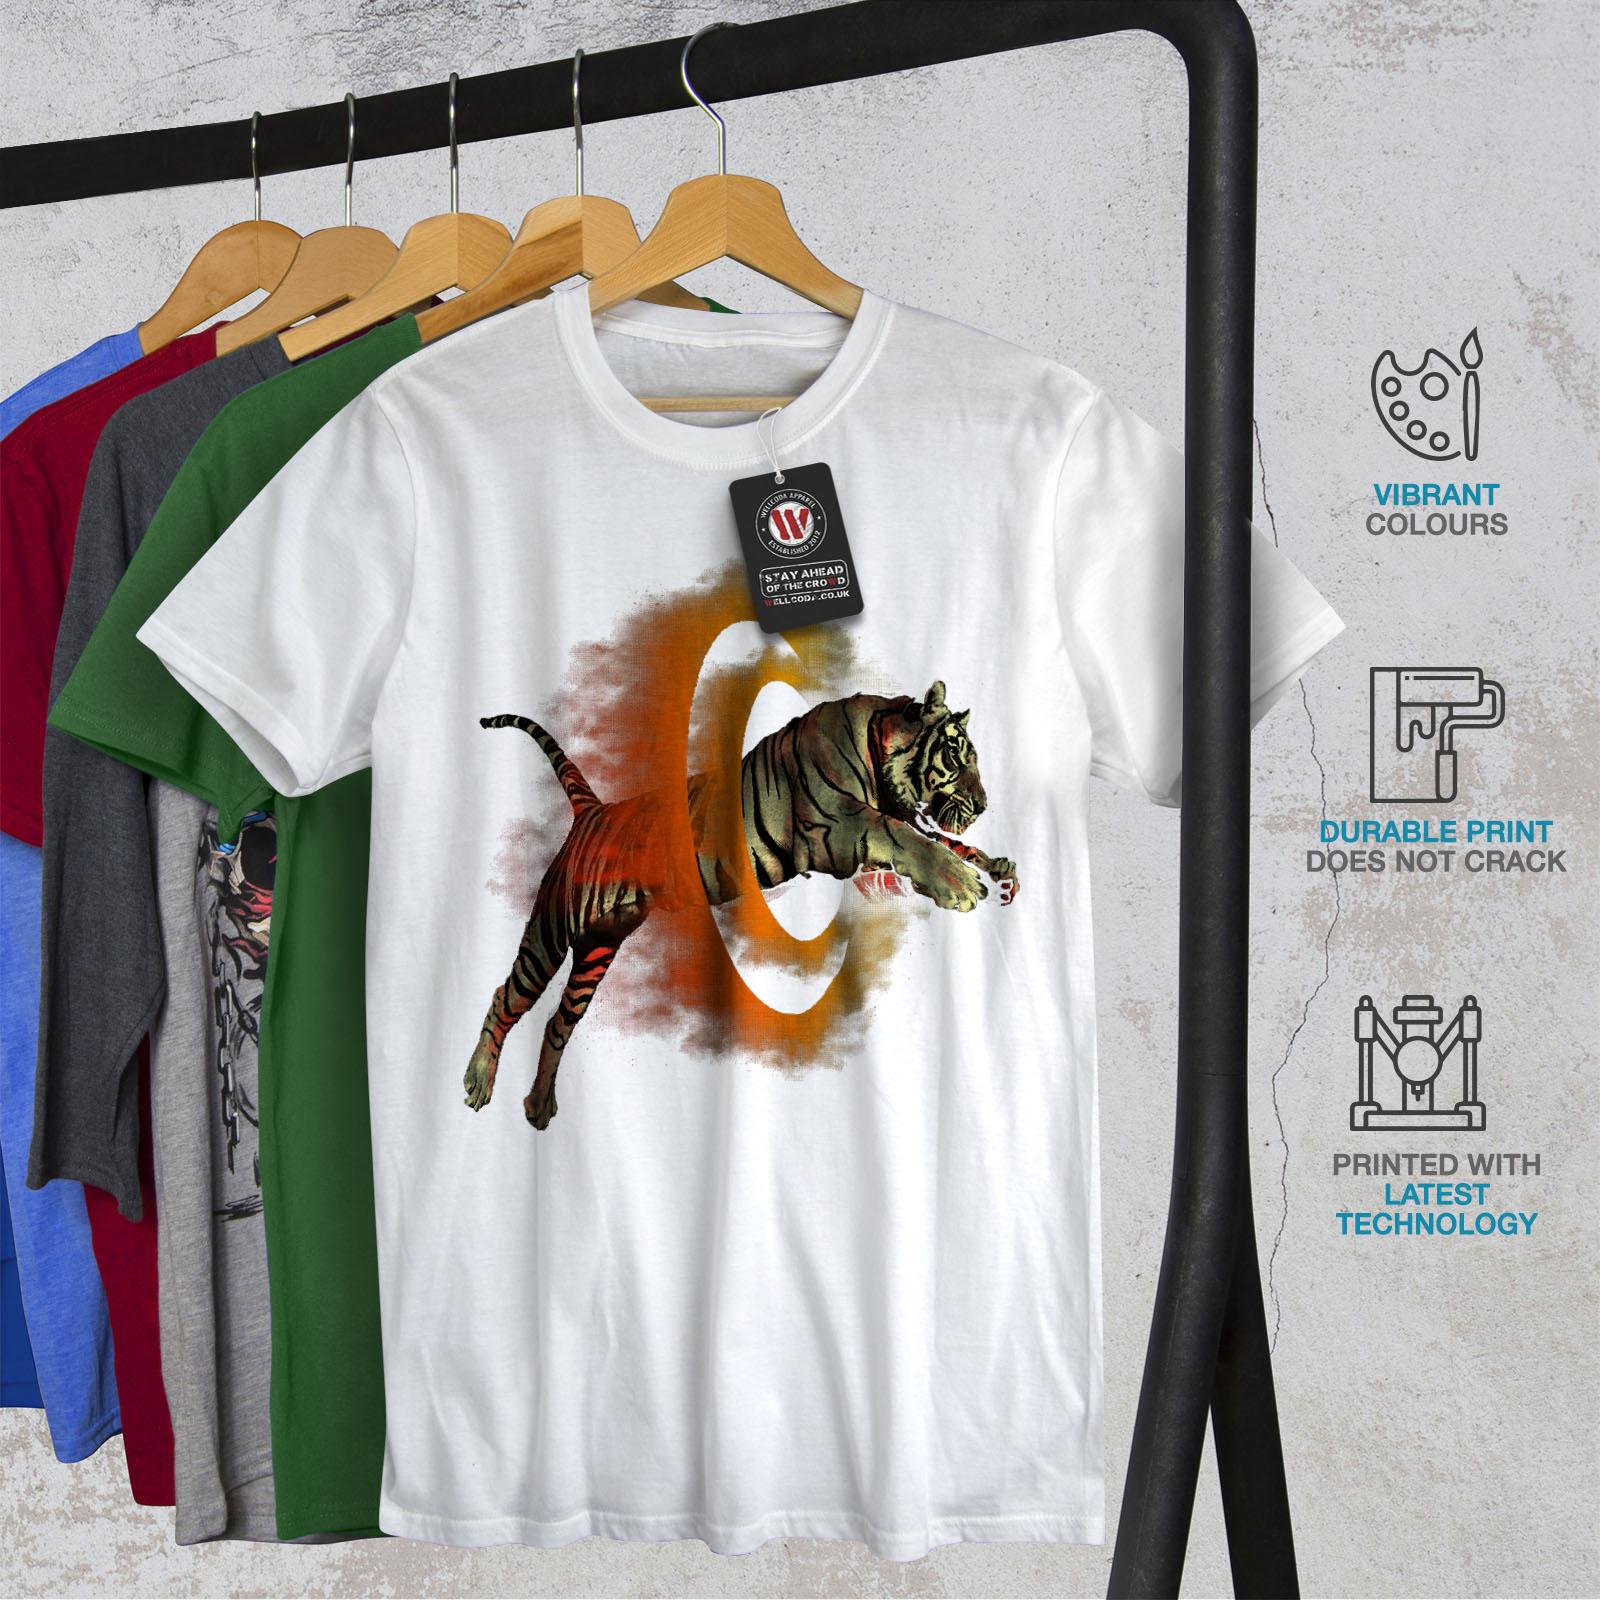 Wellcoda-Tiger-Portal-Cool-Mens-T-shirt-Flame-Graphic-Design-Printed-Tee thumbnail 12